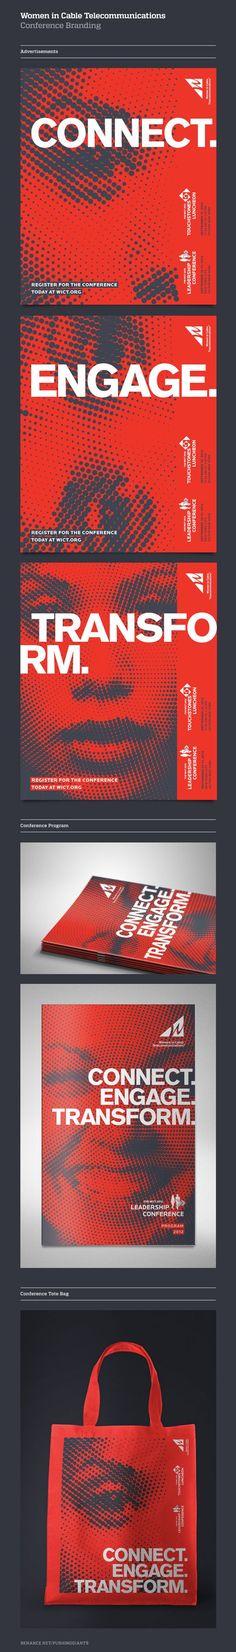 Conference Branding. Design: Greg Spraker / ©Fuszion